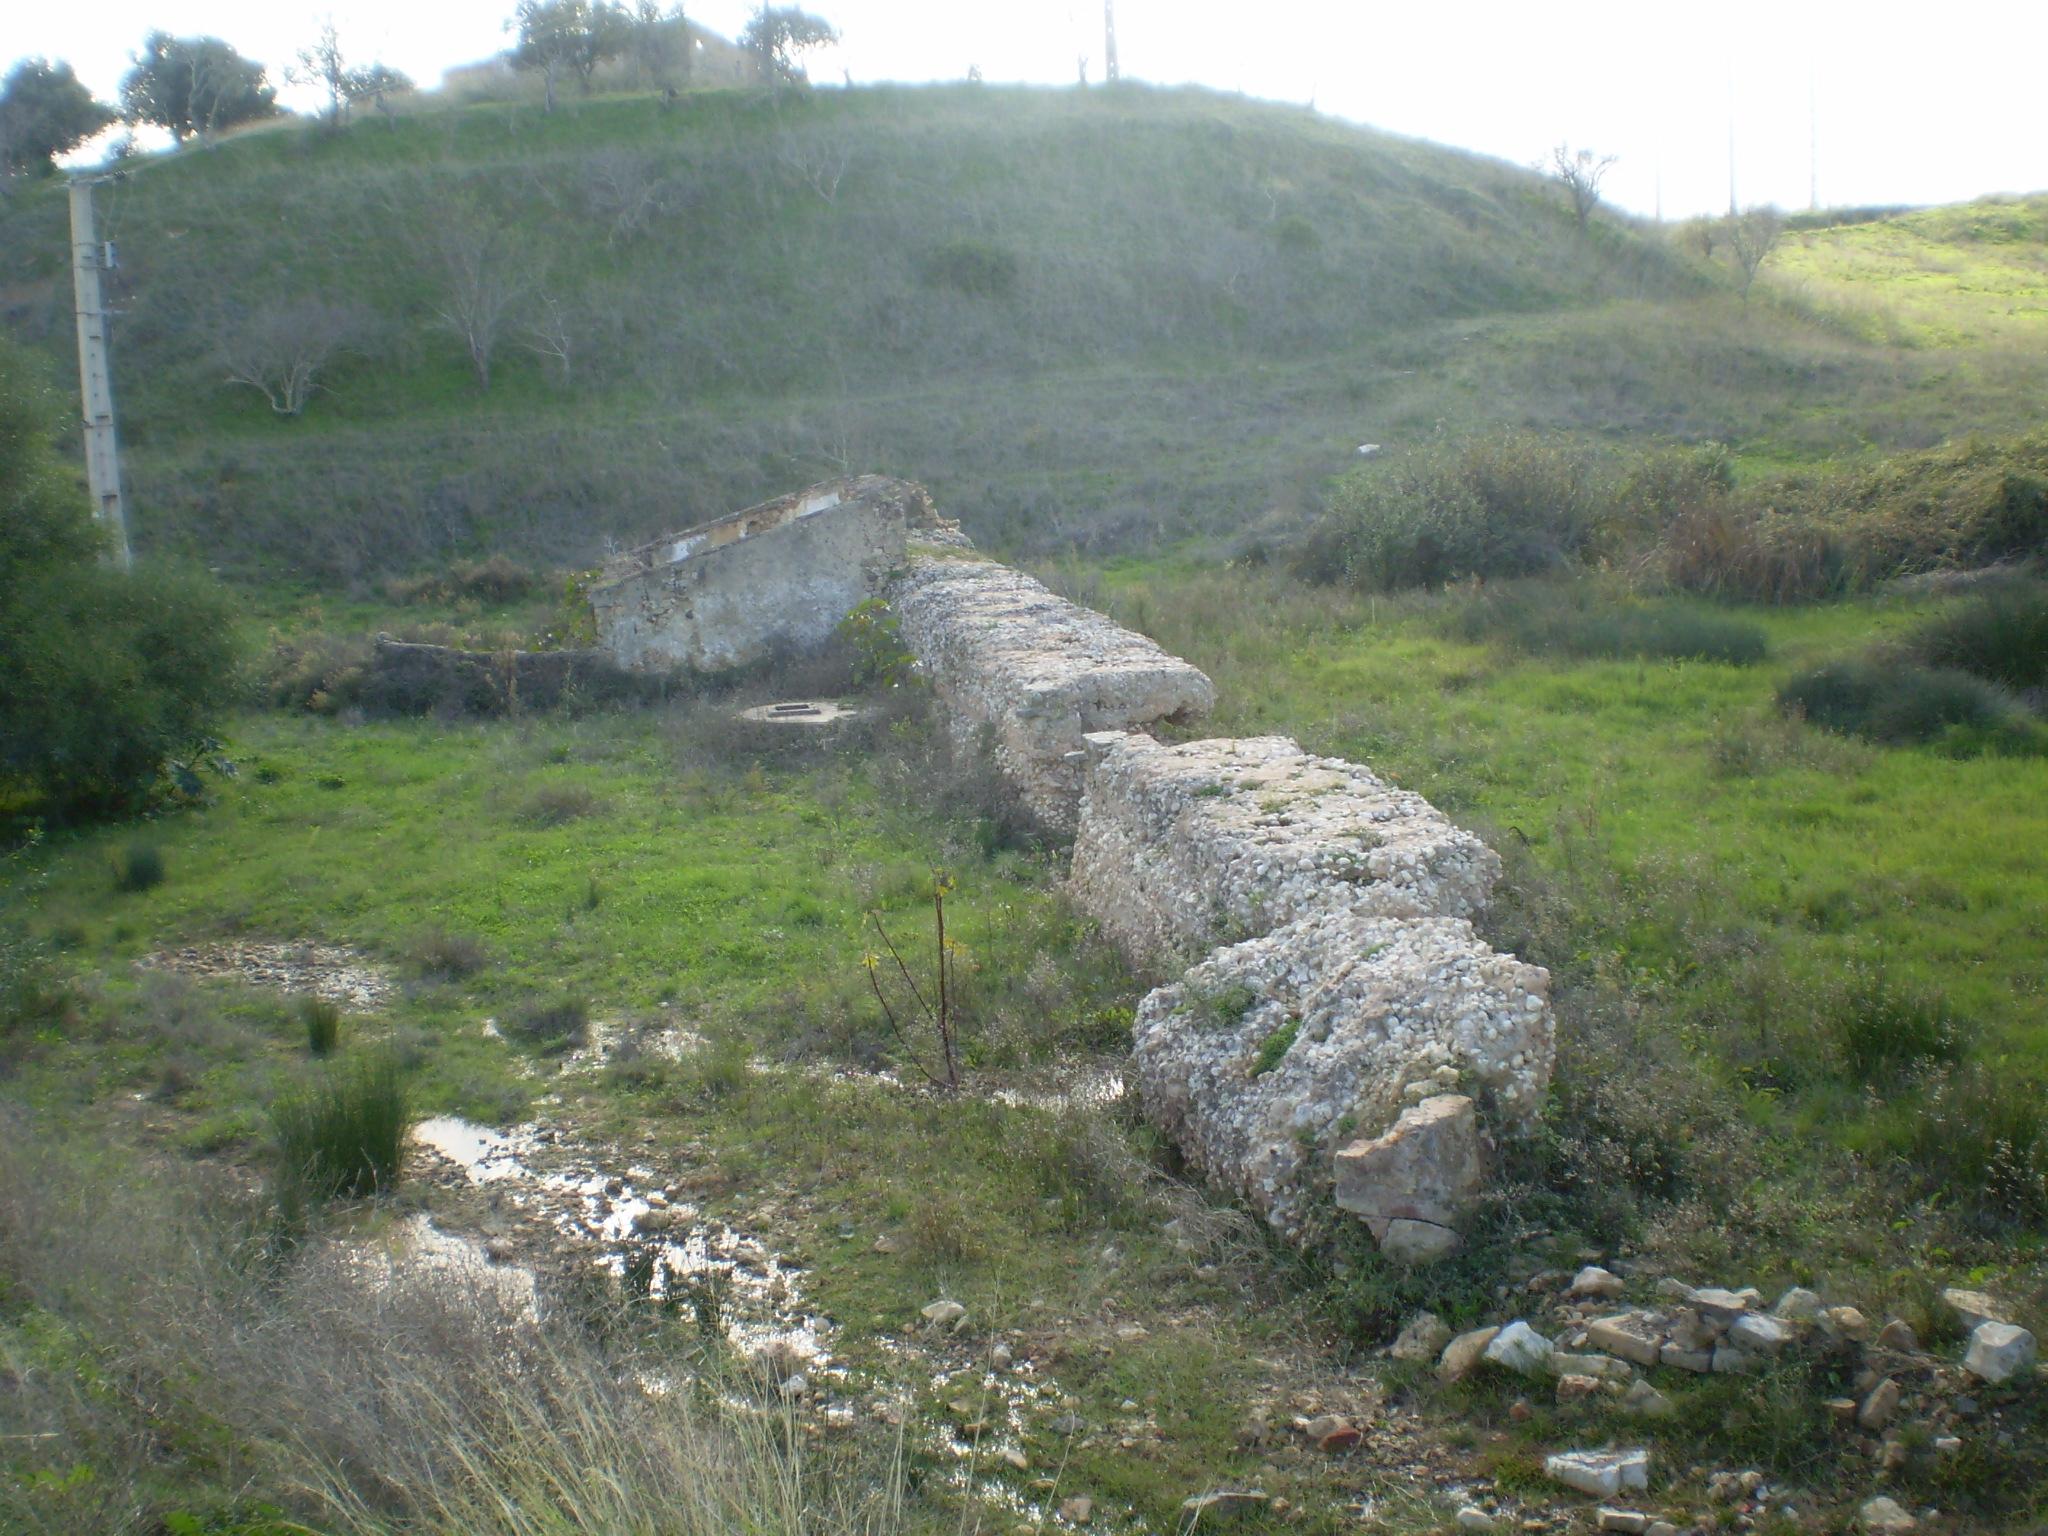 Barragem da Fonte Coberta